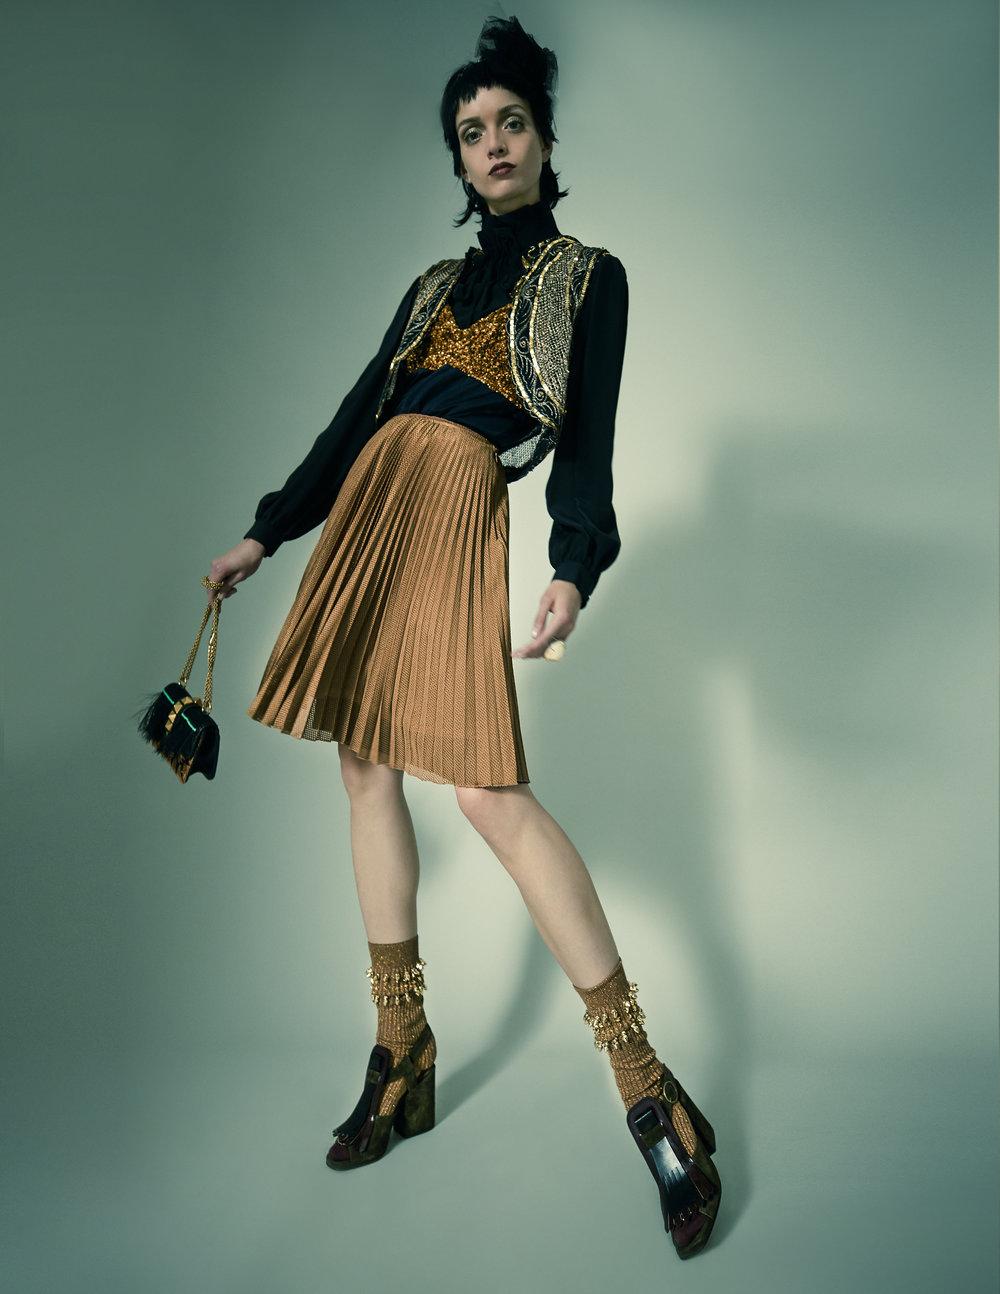 Skirt – PradaShirt – Dega Dress – Dries Van Noten Gilet – Laurence Bras Bag – Valentino Ring – Alexander McQueen Headpiece – Lanvin Socks – Benedict